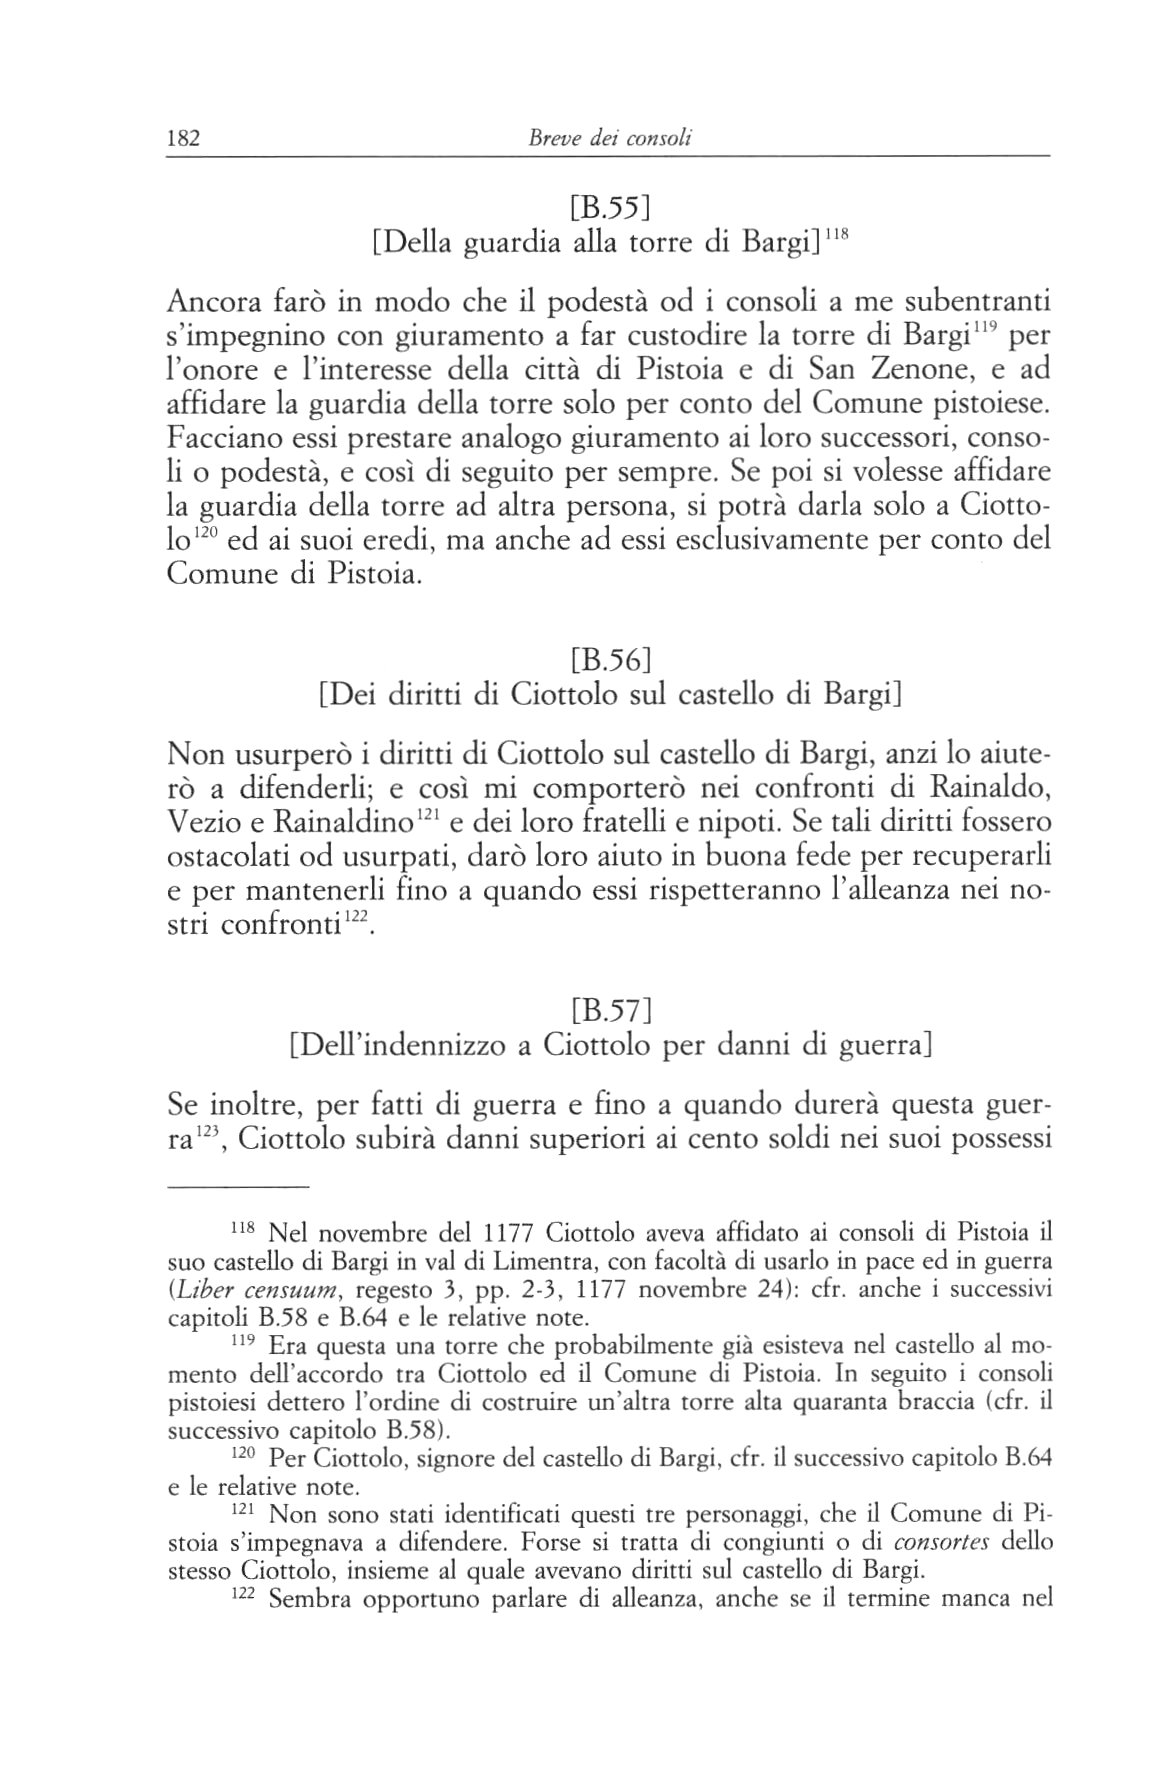 statuti pistoiesi del sec.XII 0182.jpg